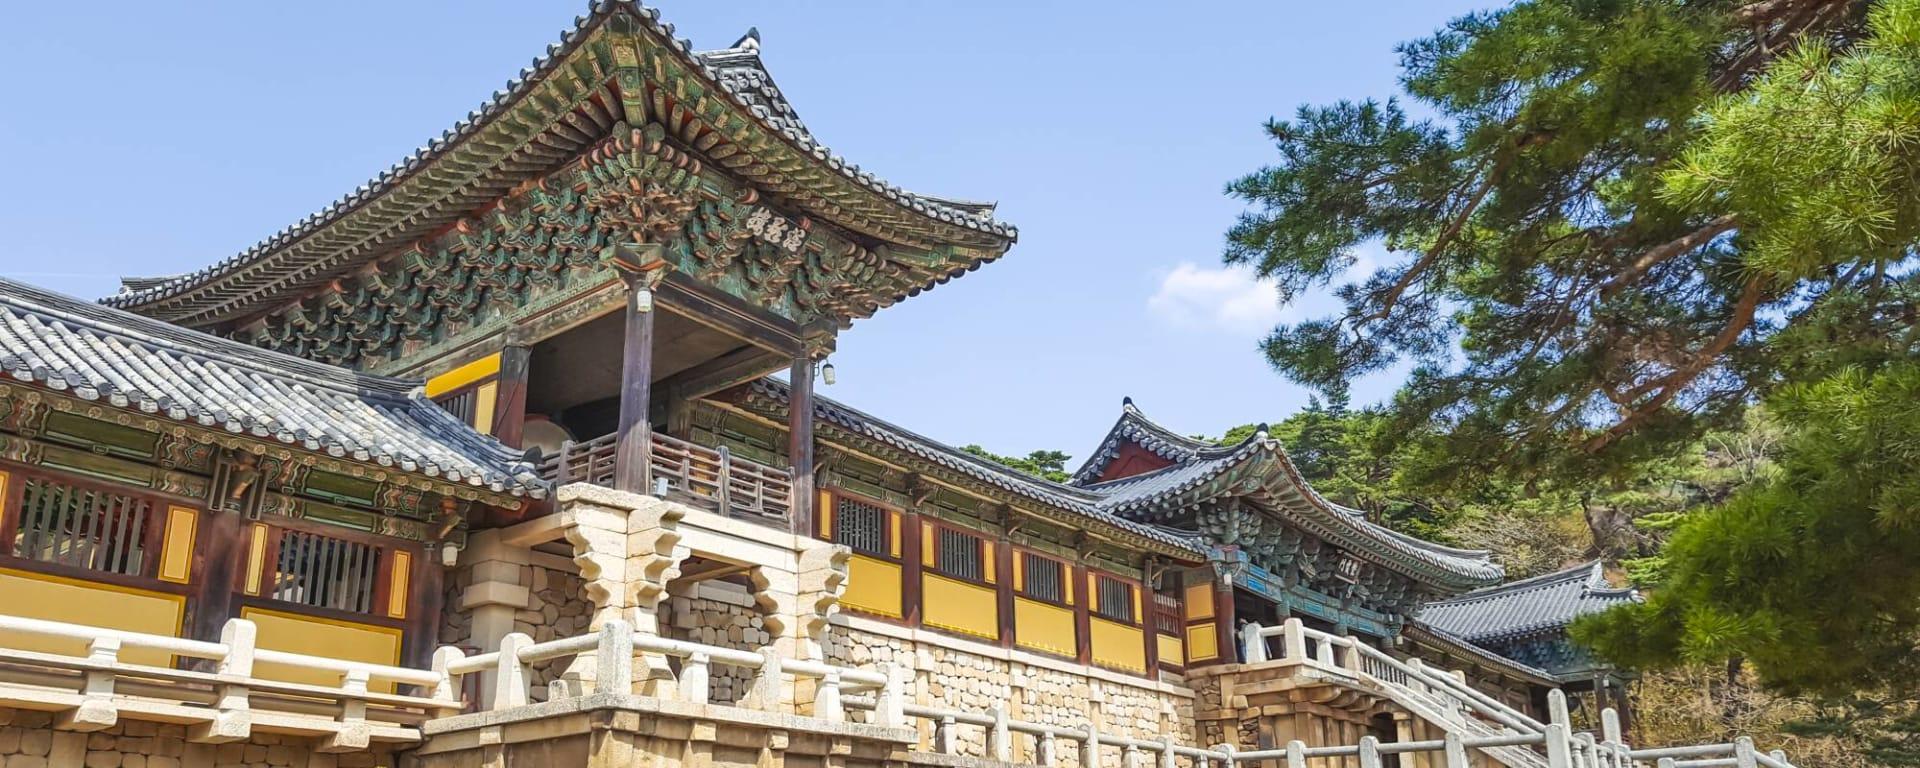 Südkorea entdecken mit Tischler Reisen: Südkorea Gyeongju Bulguksa Tempel